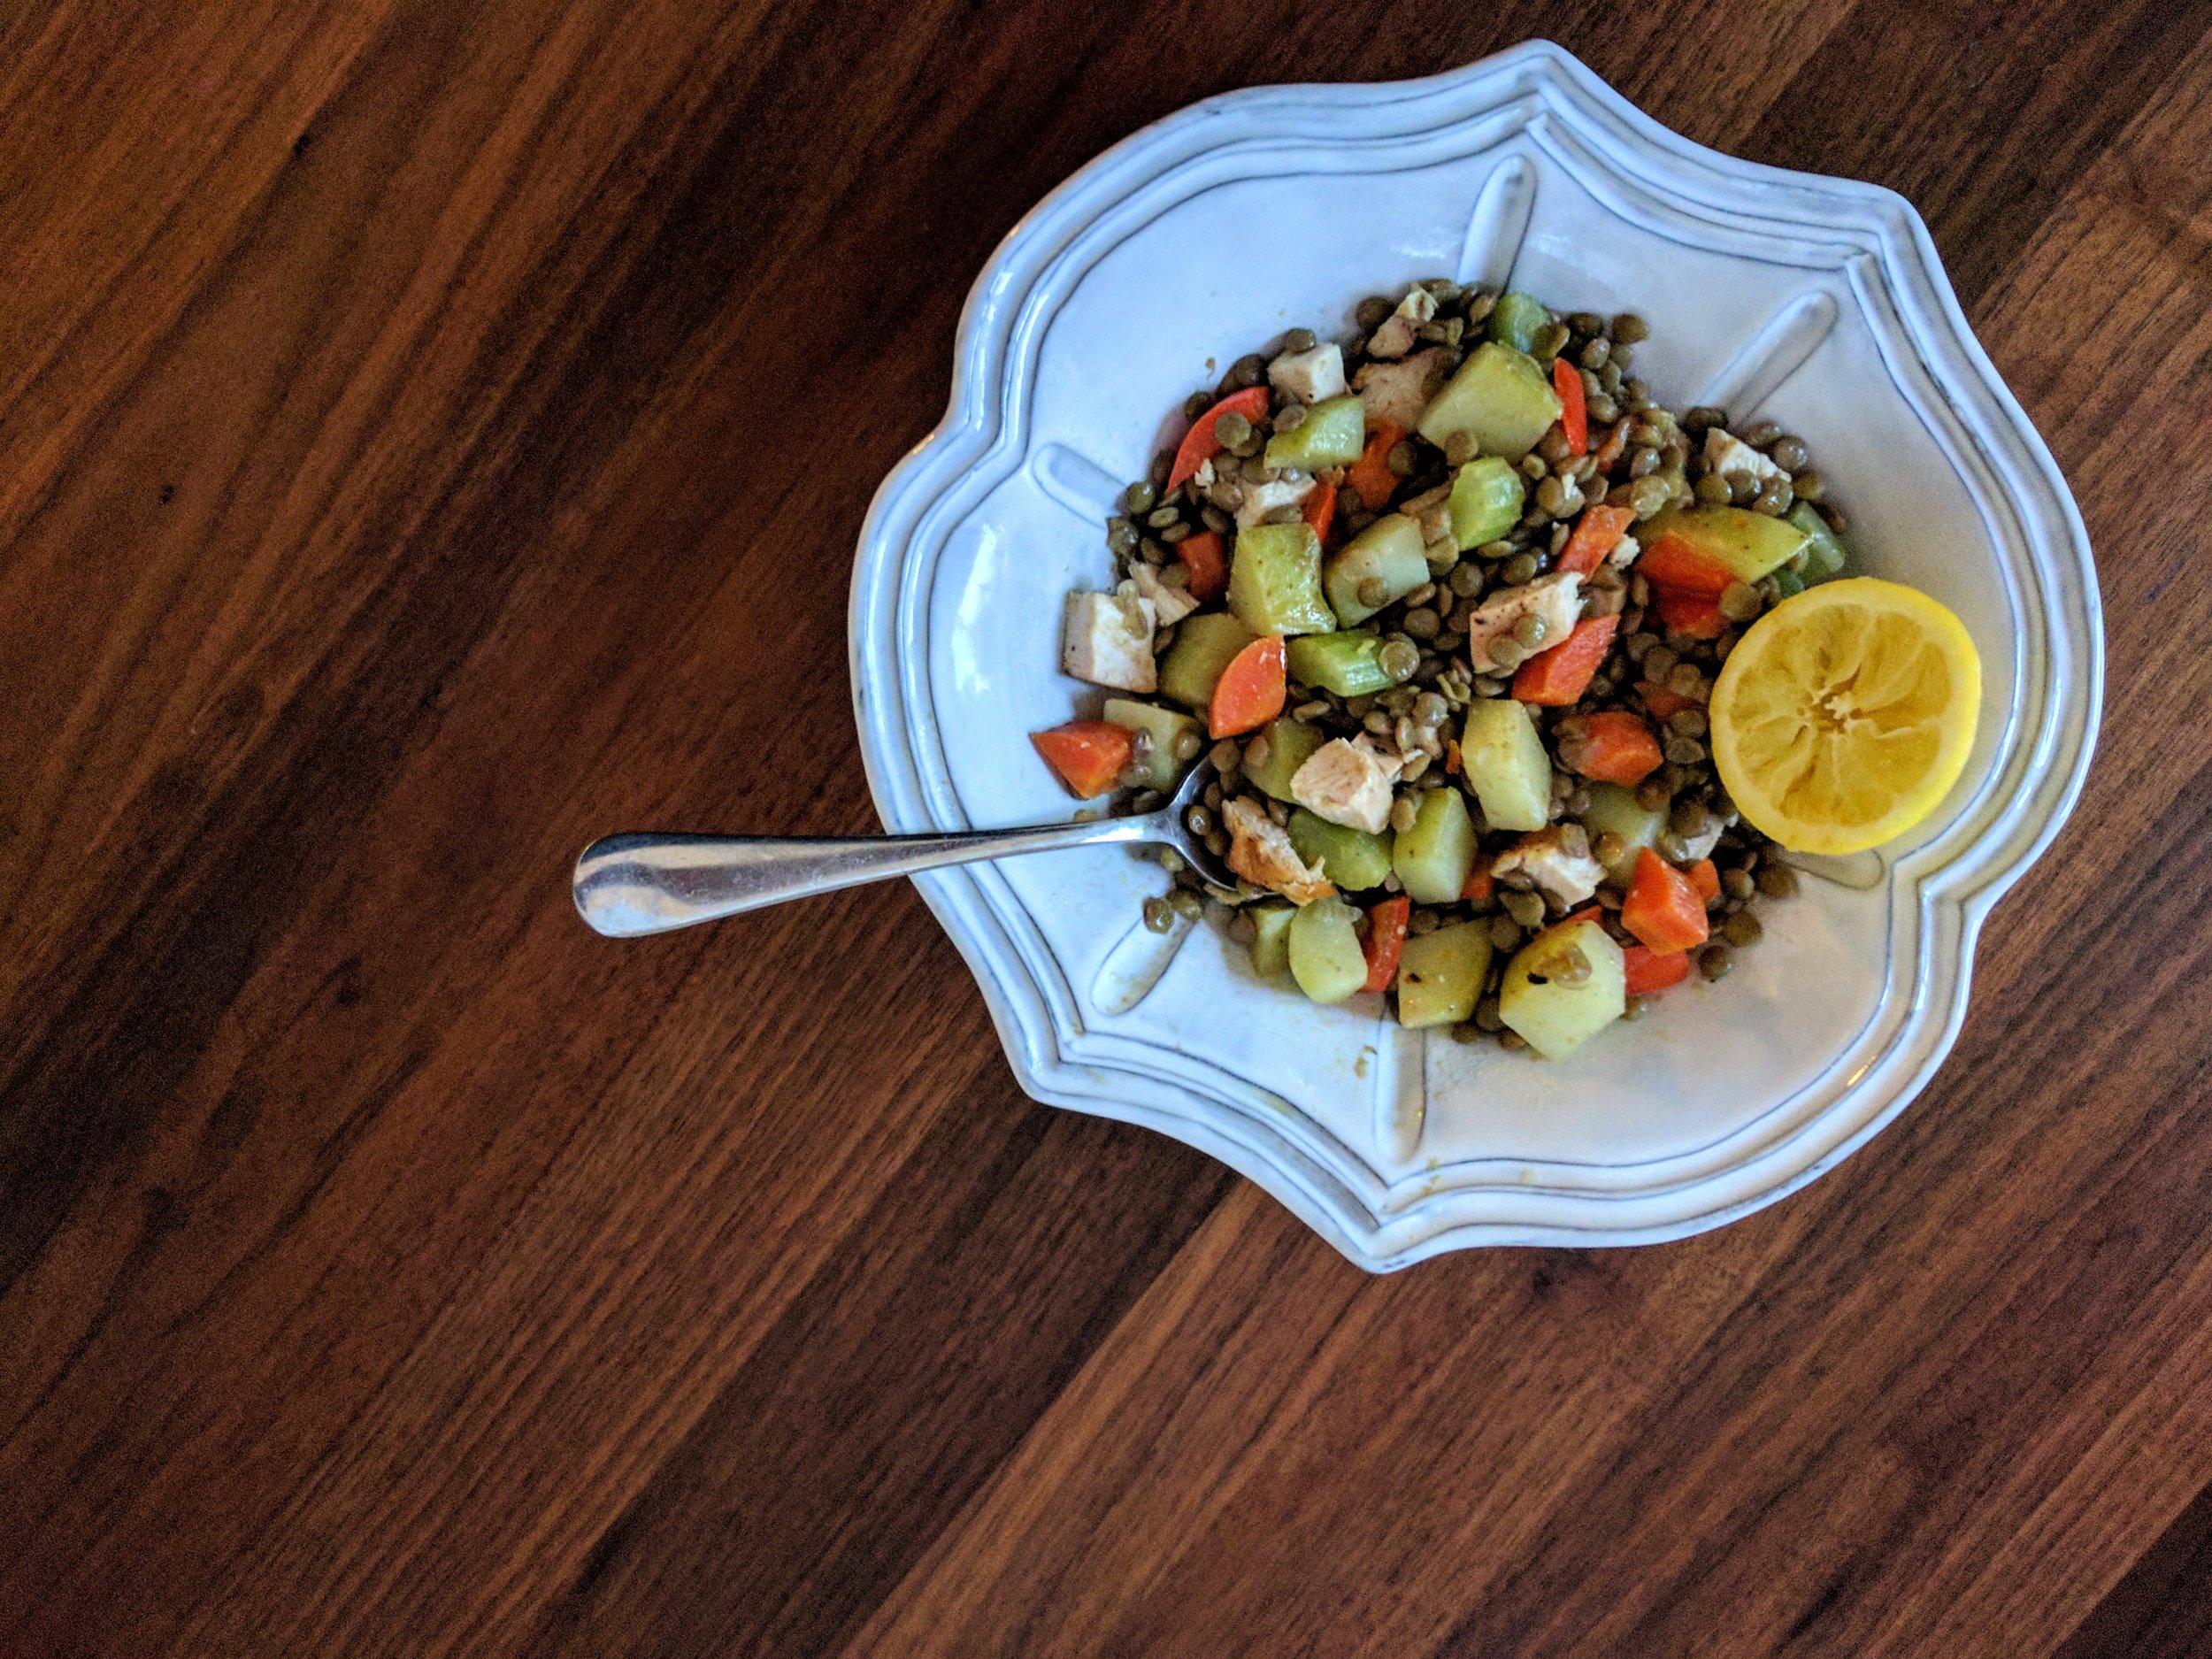 Lentils with Veggies & Chicken